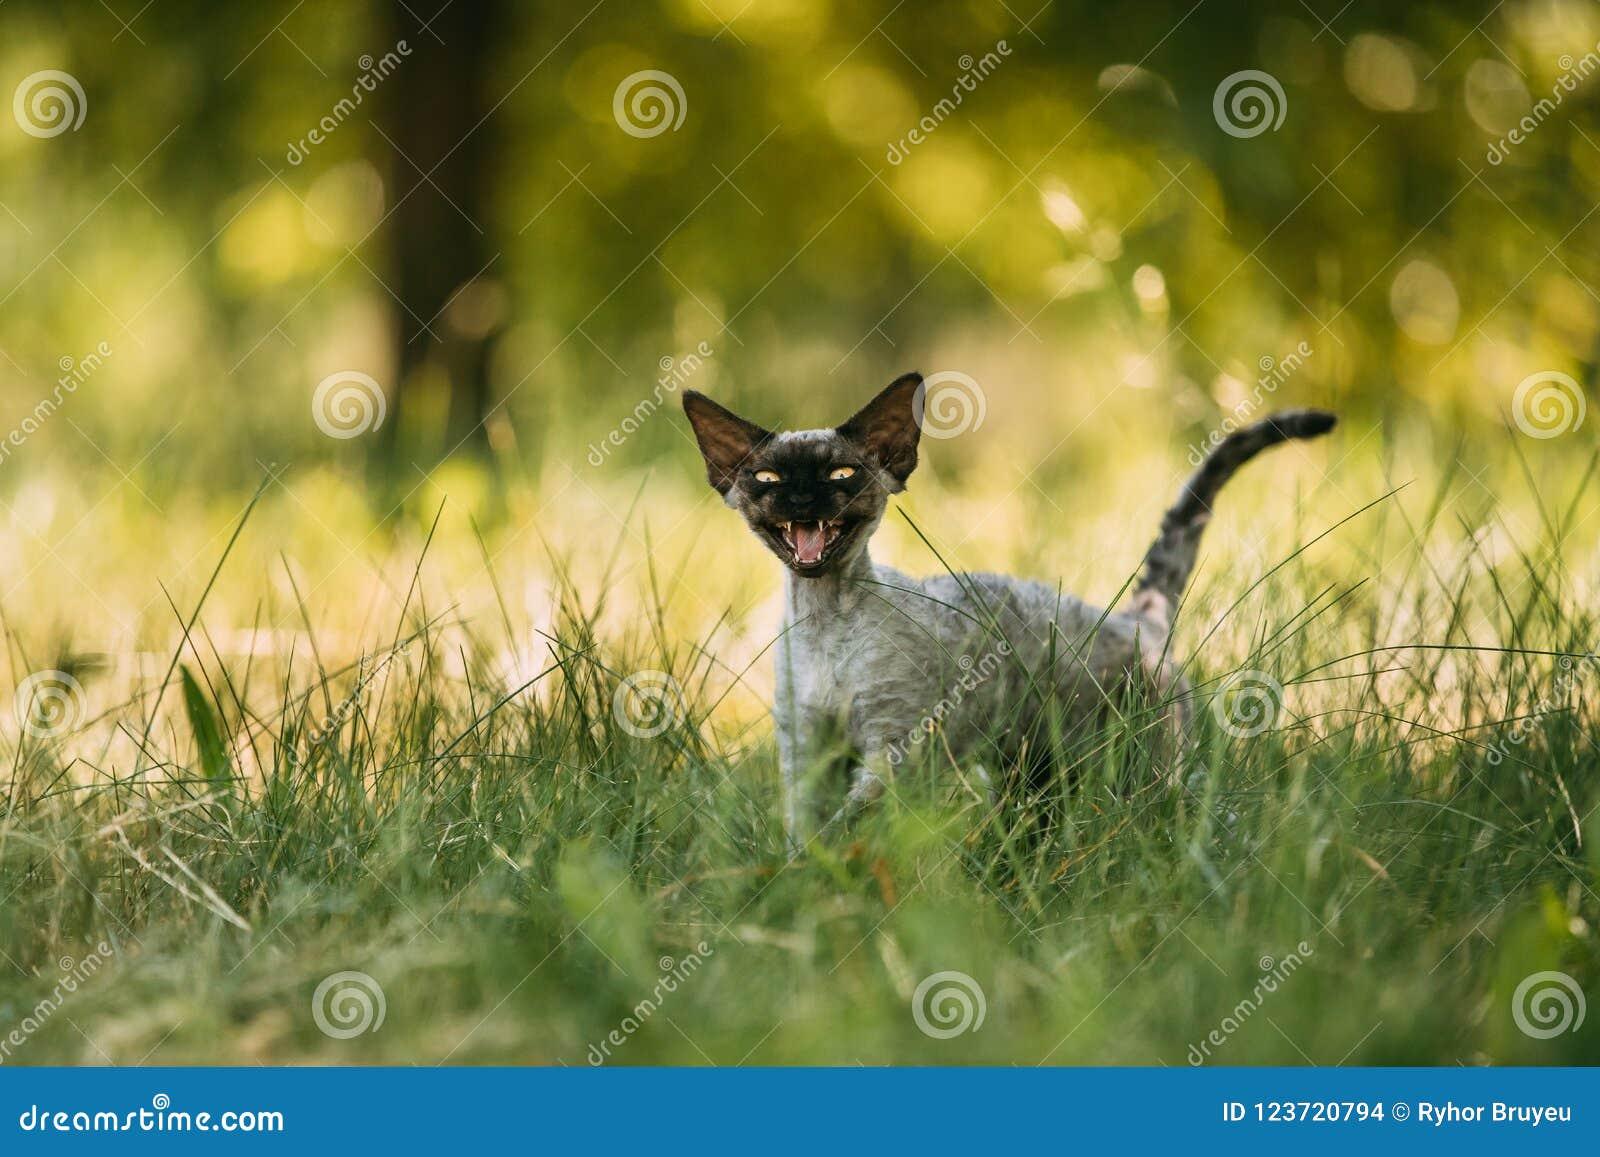 Grappig Jong Gray Devon Rex Kitten Meowing In Green-Gras Kortharige kat